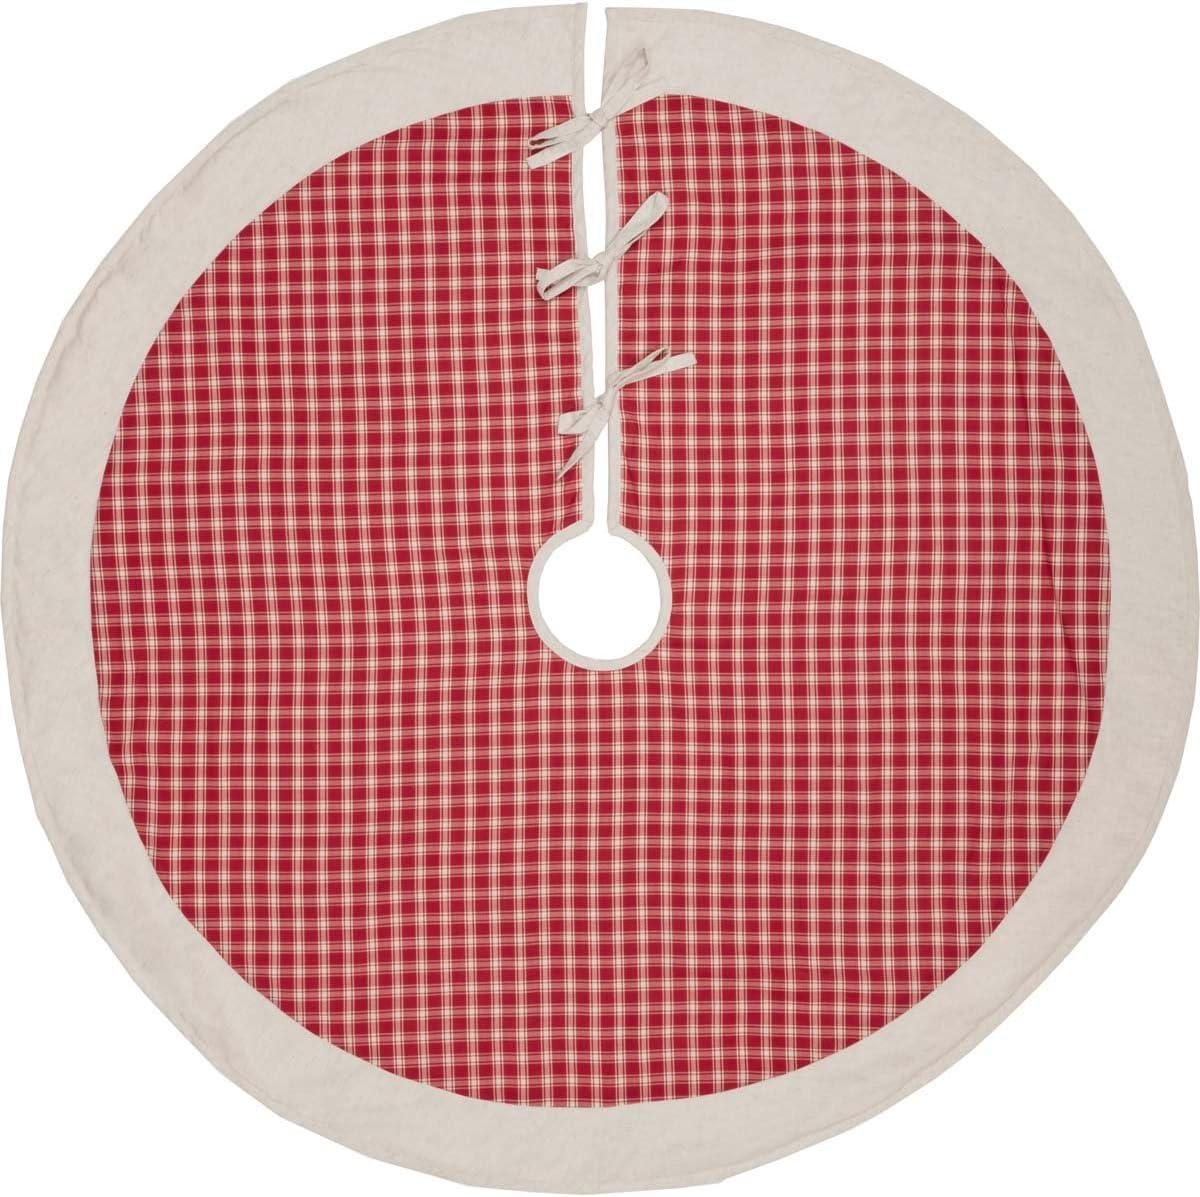 "VHC Brands Holiday Decor-Red Plaid Tree Skirt, 48"" Diameter"